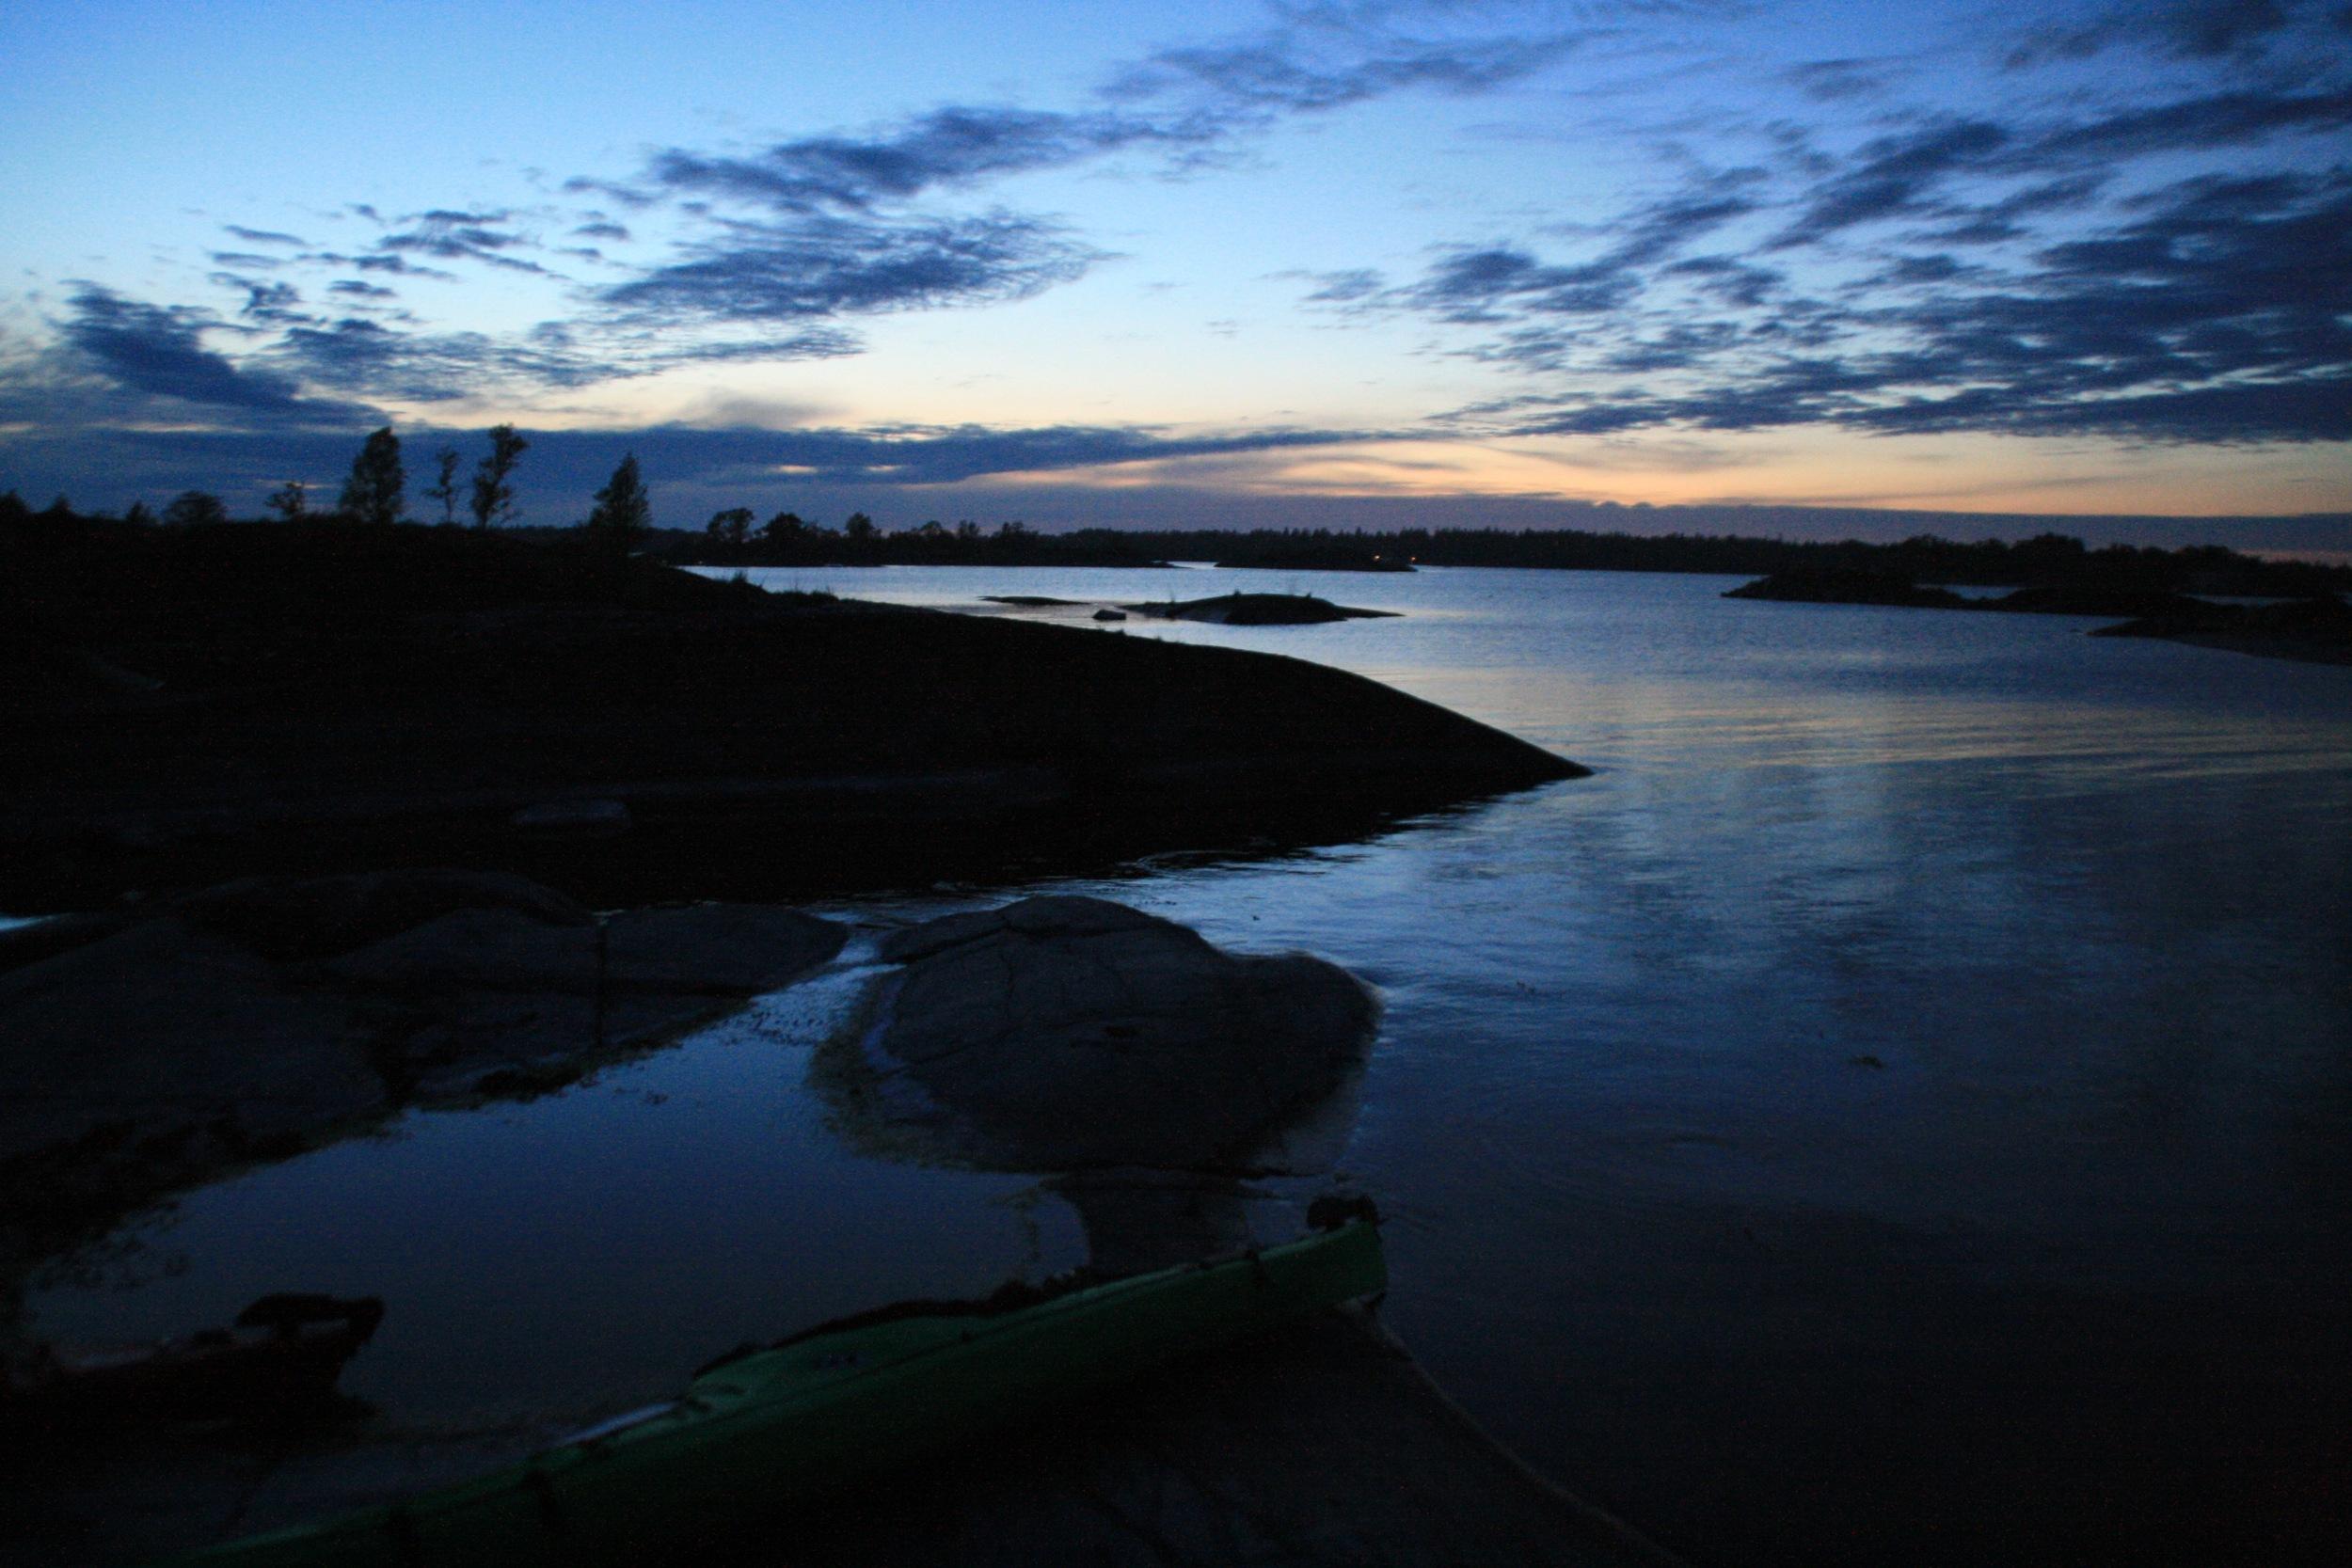 Stockholm Archipelago Kayaking 1 day 6